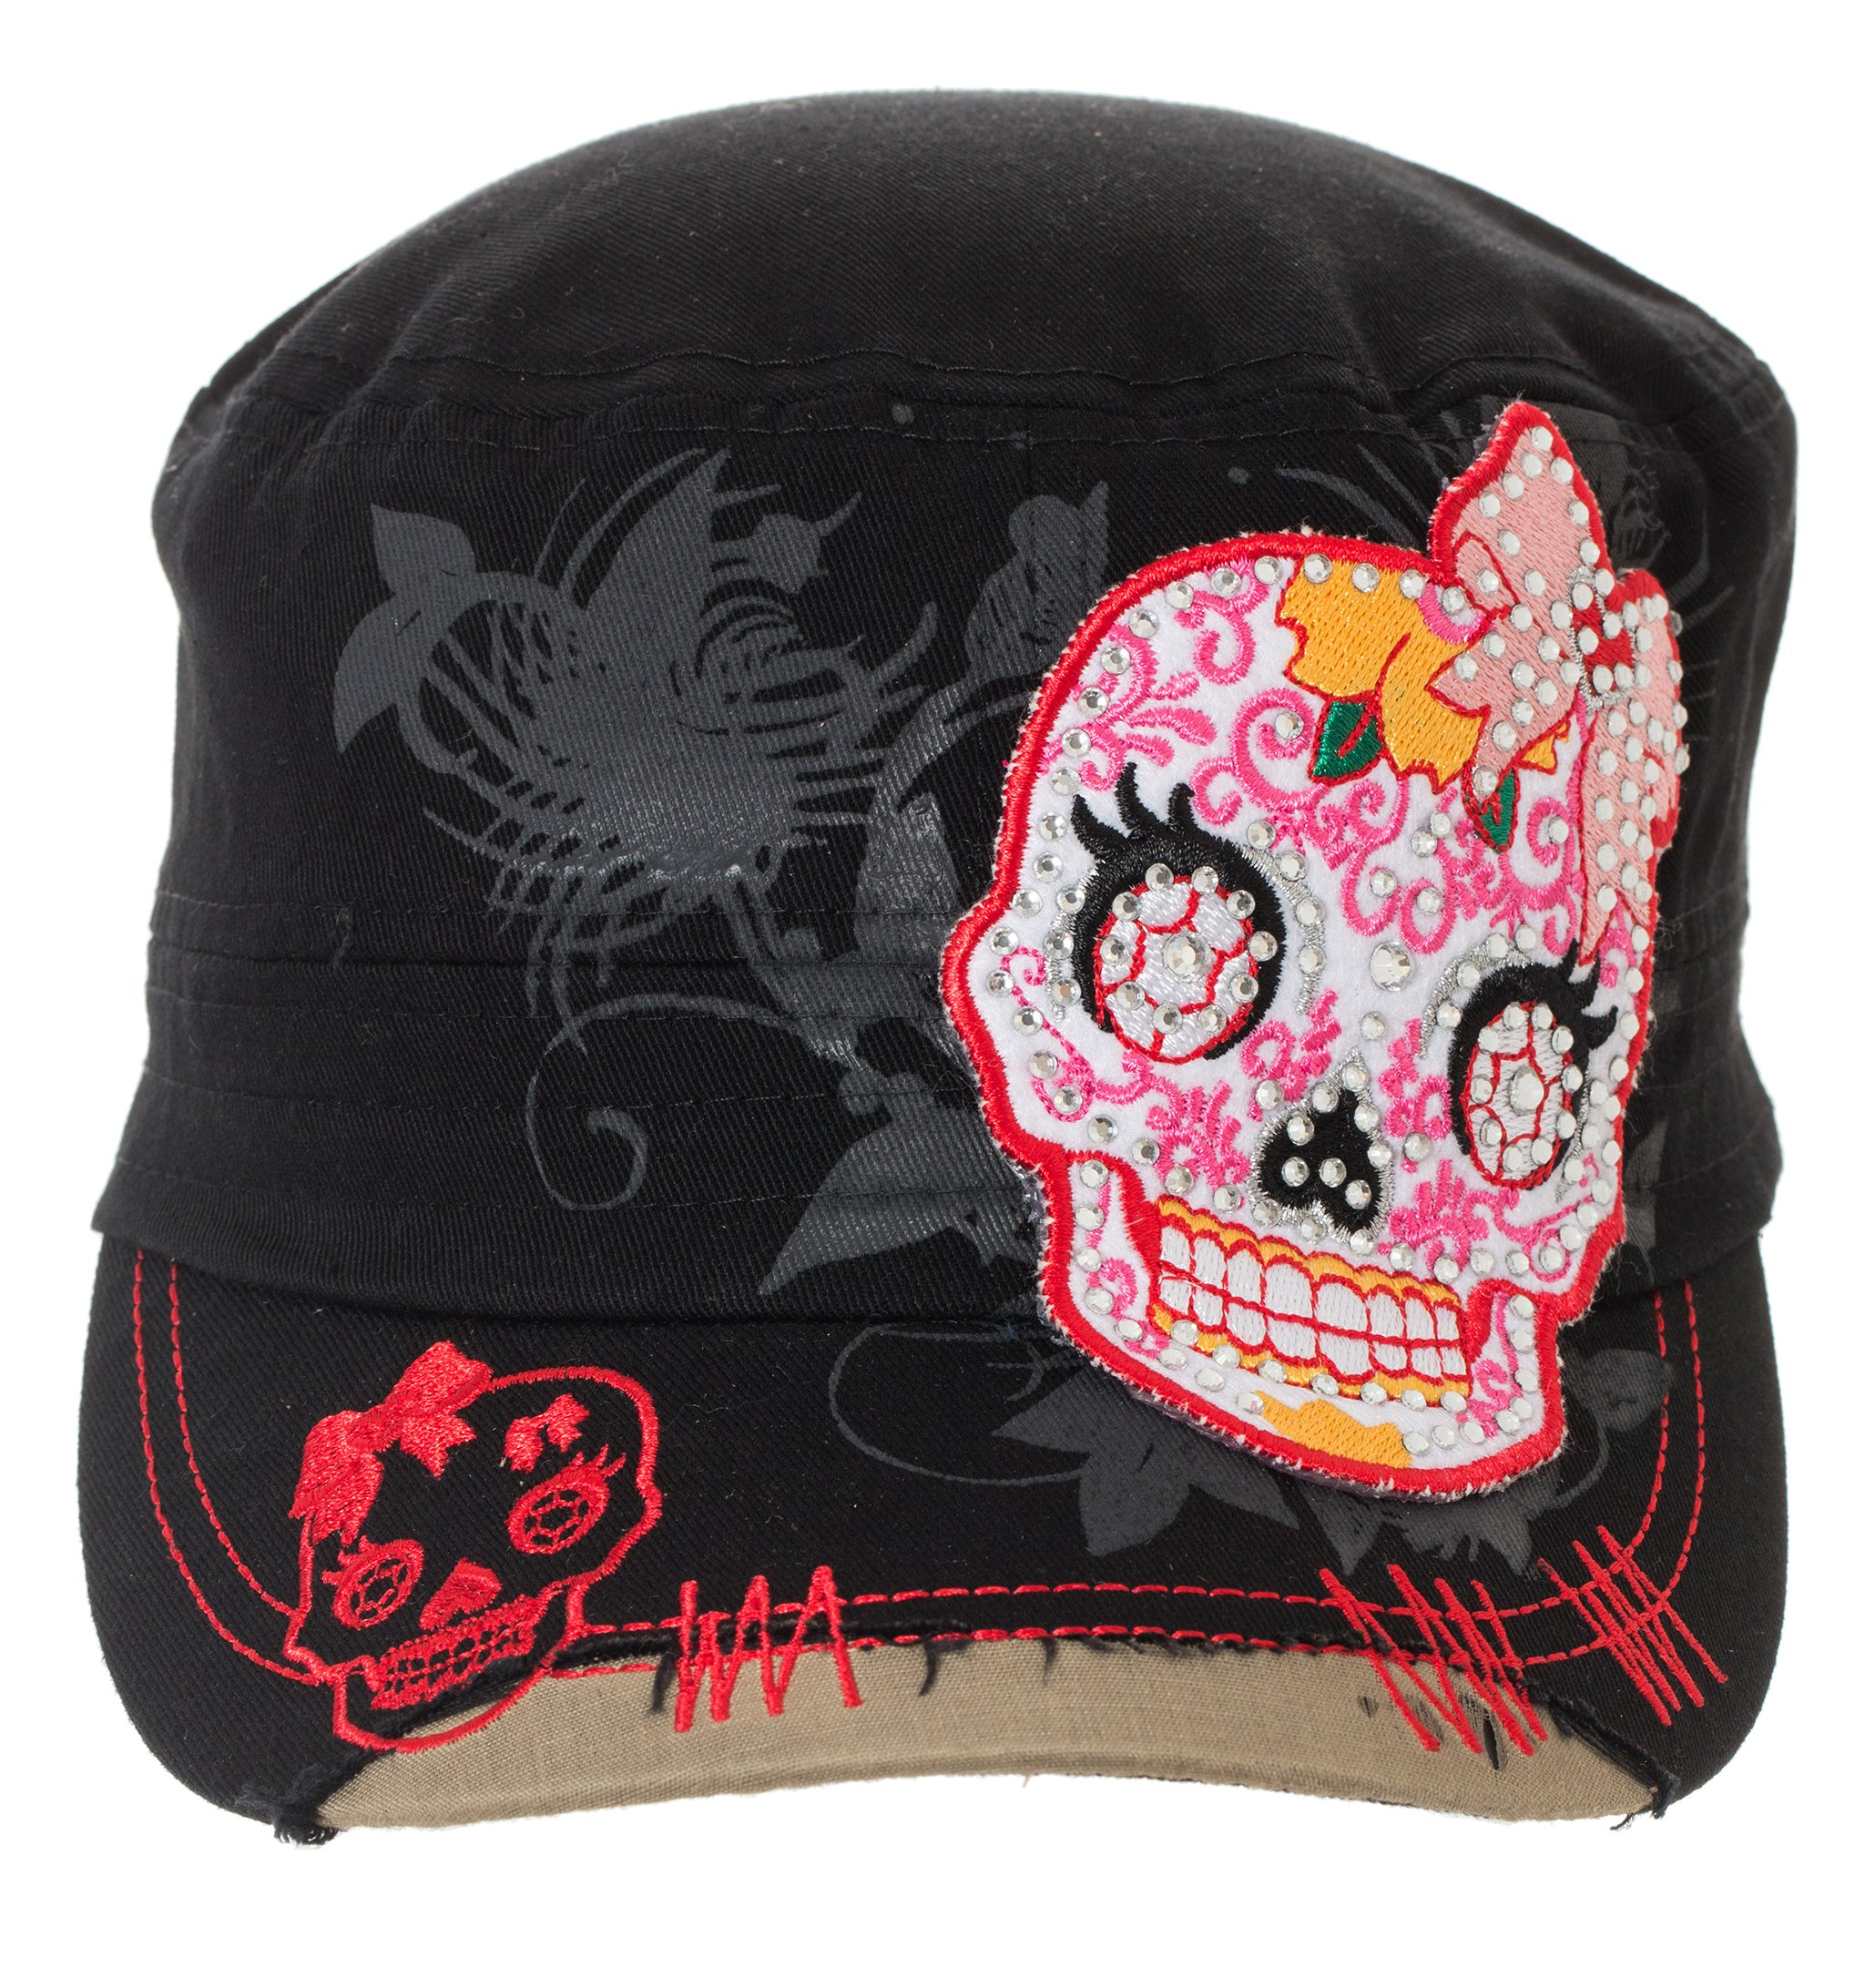 Artisan Owl Sugar Skull Military Style Black Cap with Buckle Closure (Black)